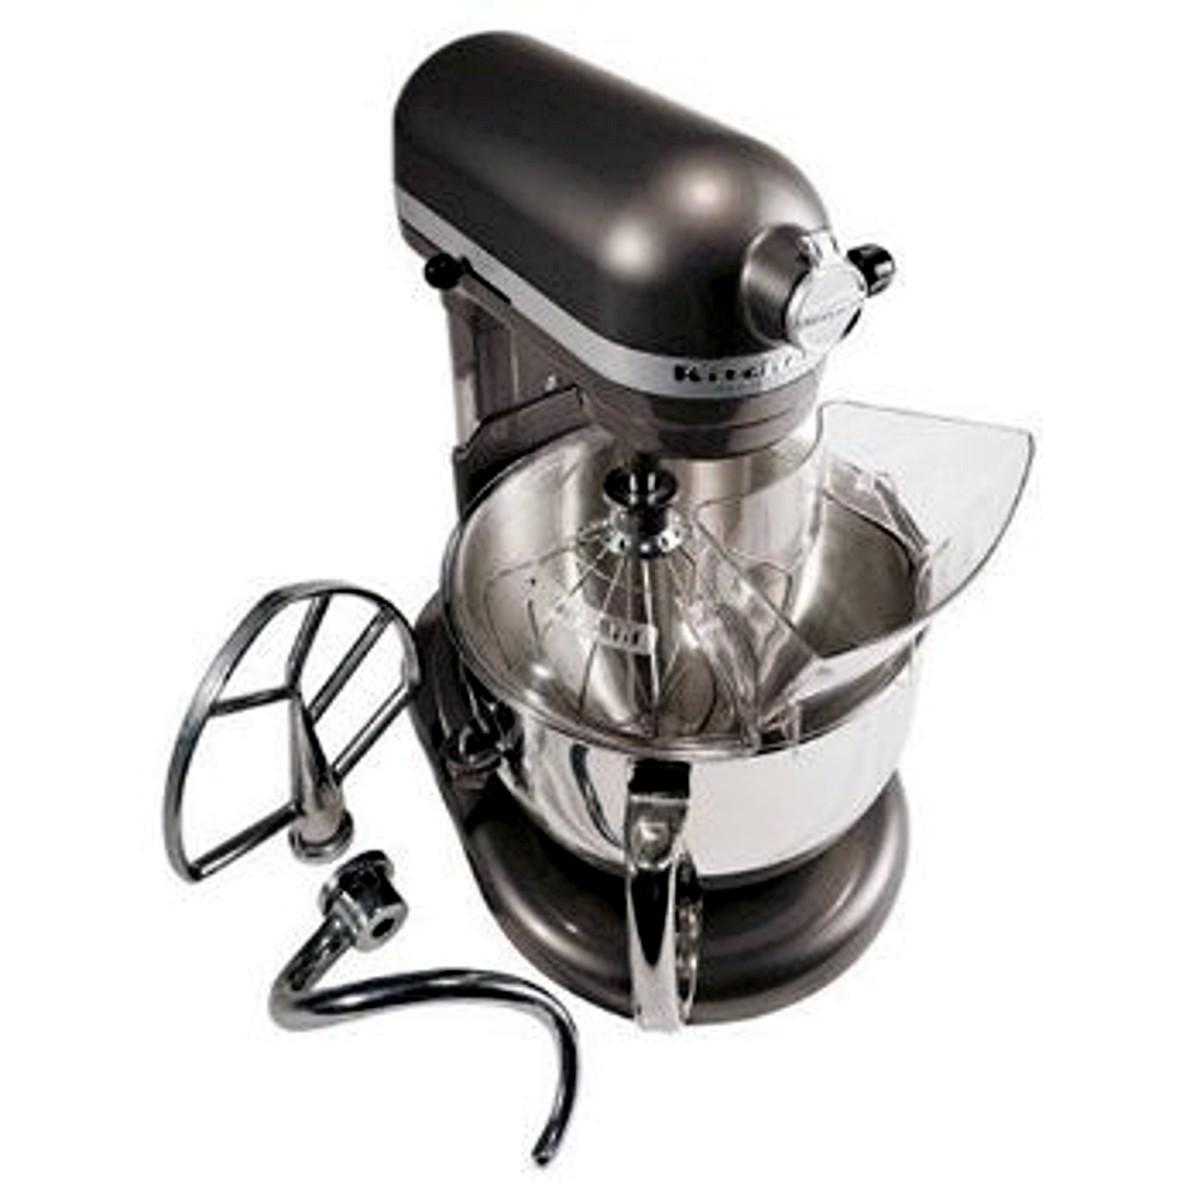 Kitchen Mixer Reviews: KitchenAid Professional 600 Series Stand Mixer Review